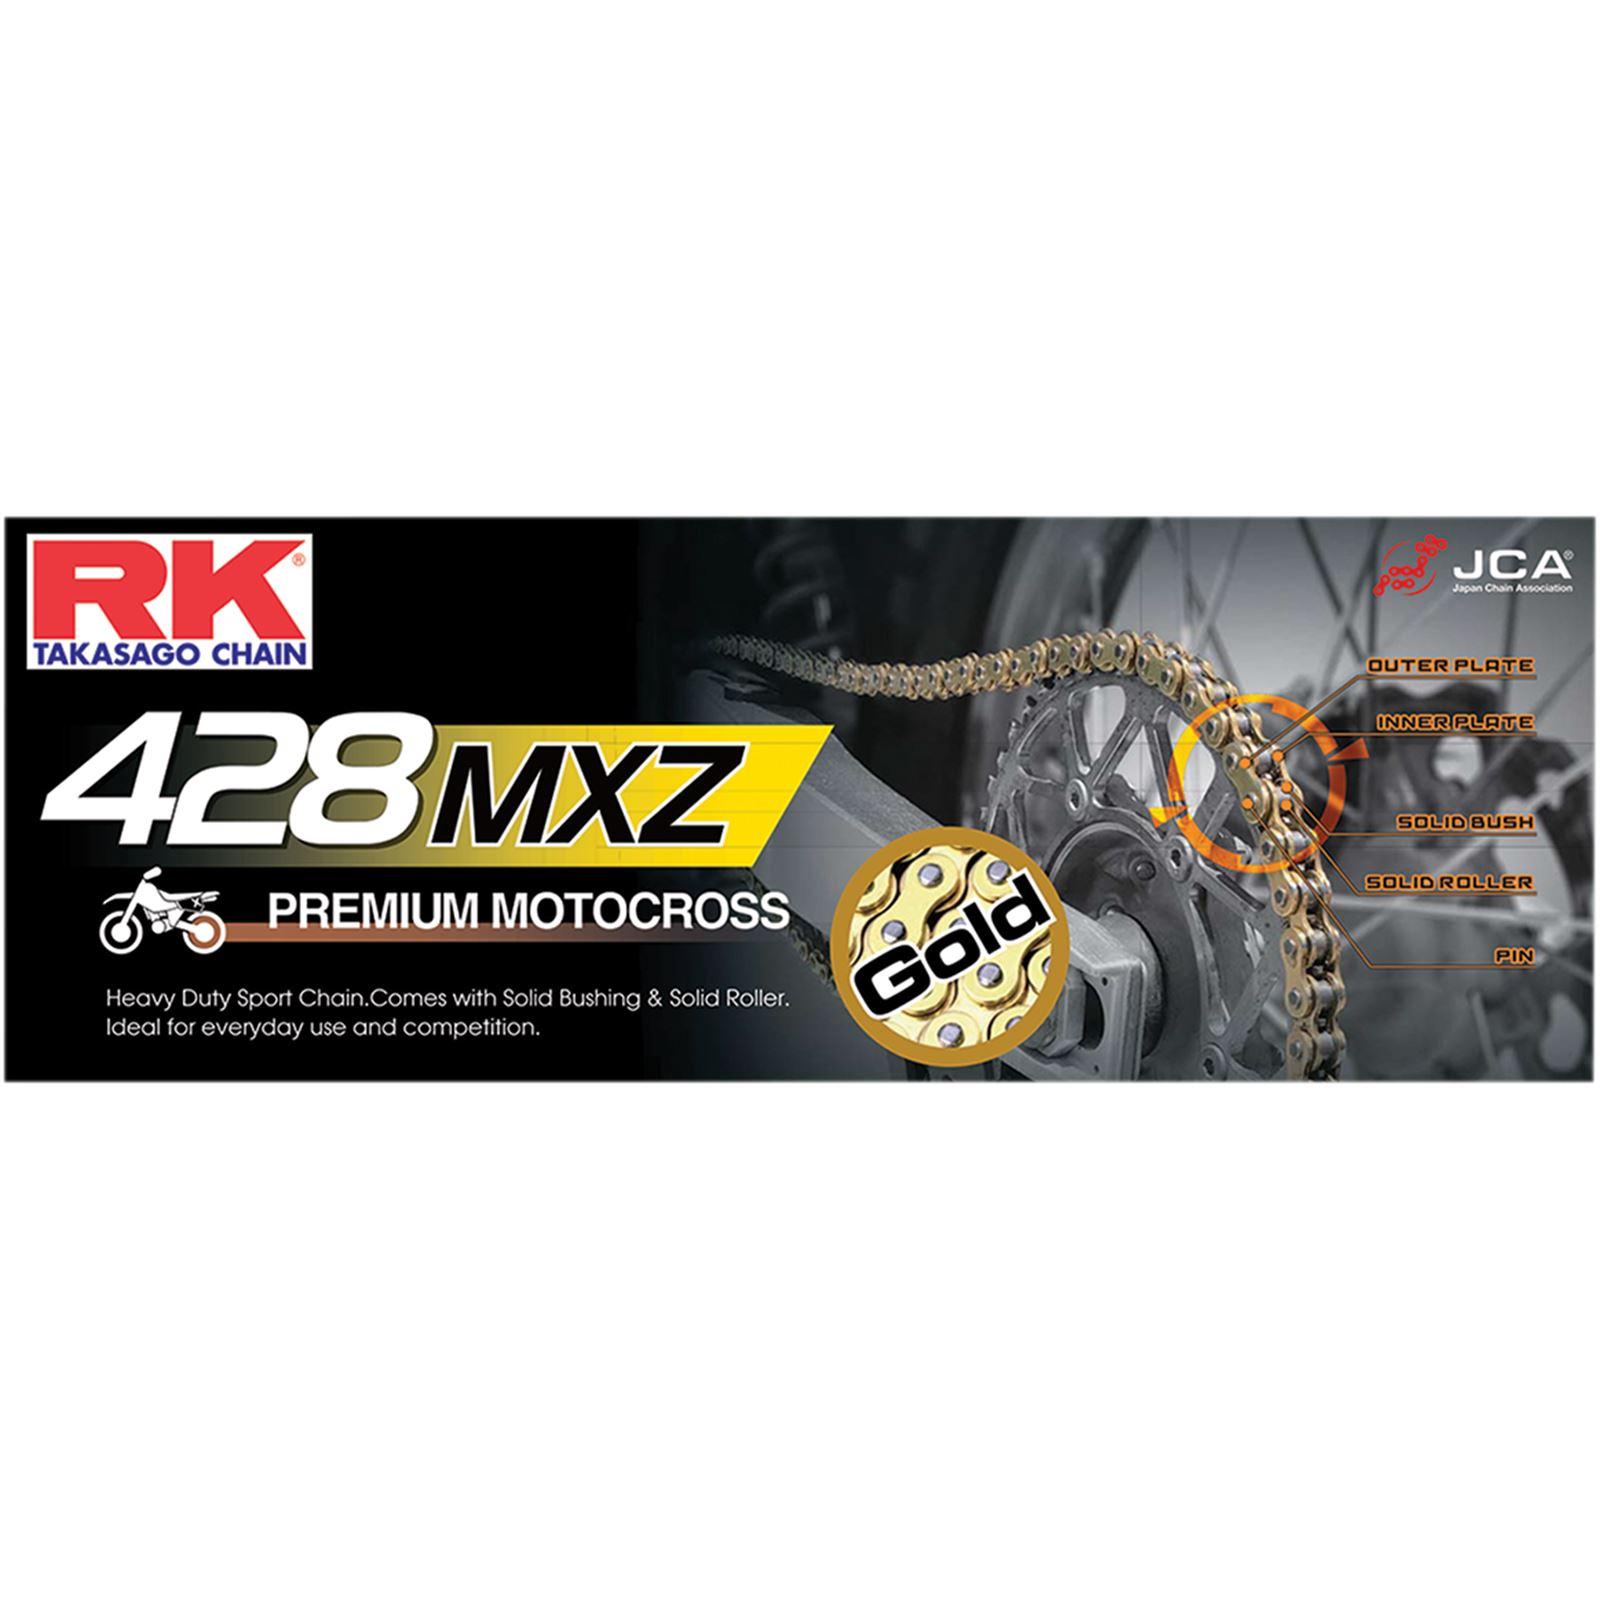 RK Excel GB 428 MXZ - Heavy Duty Bulk Chain - 25 Feet